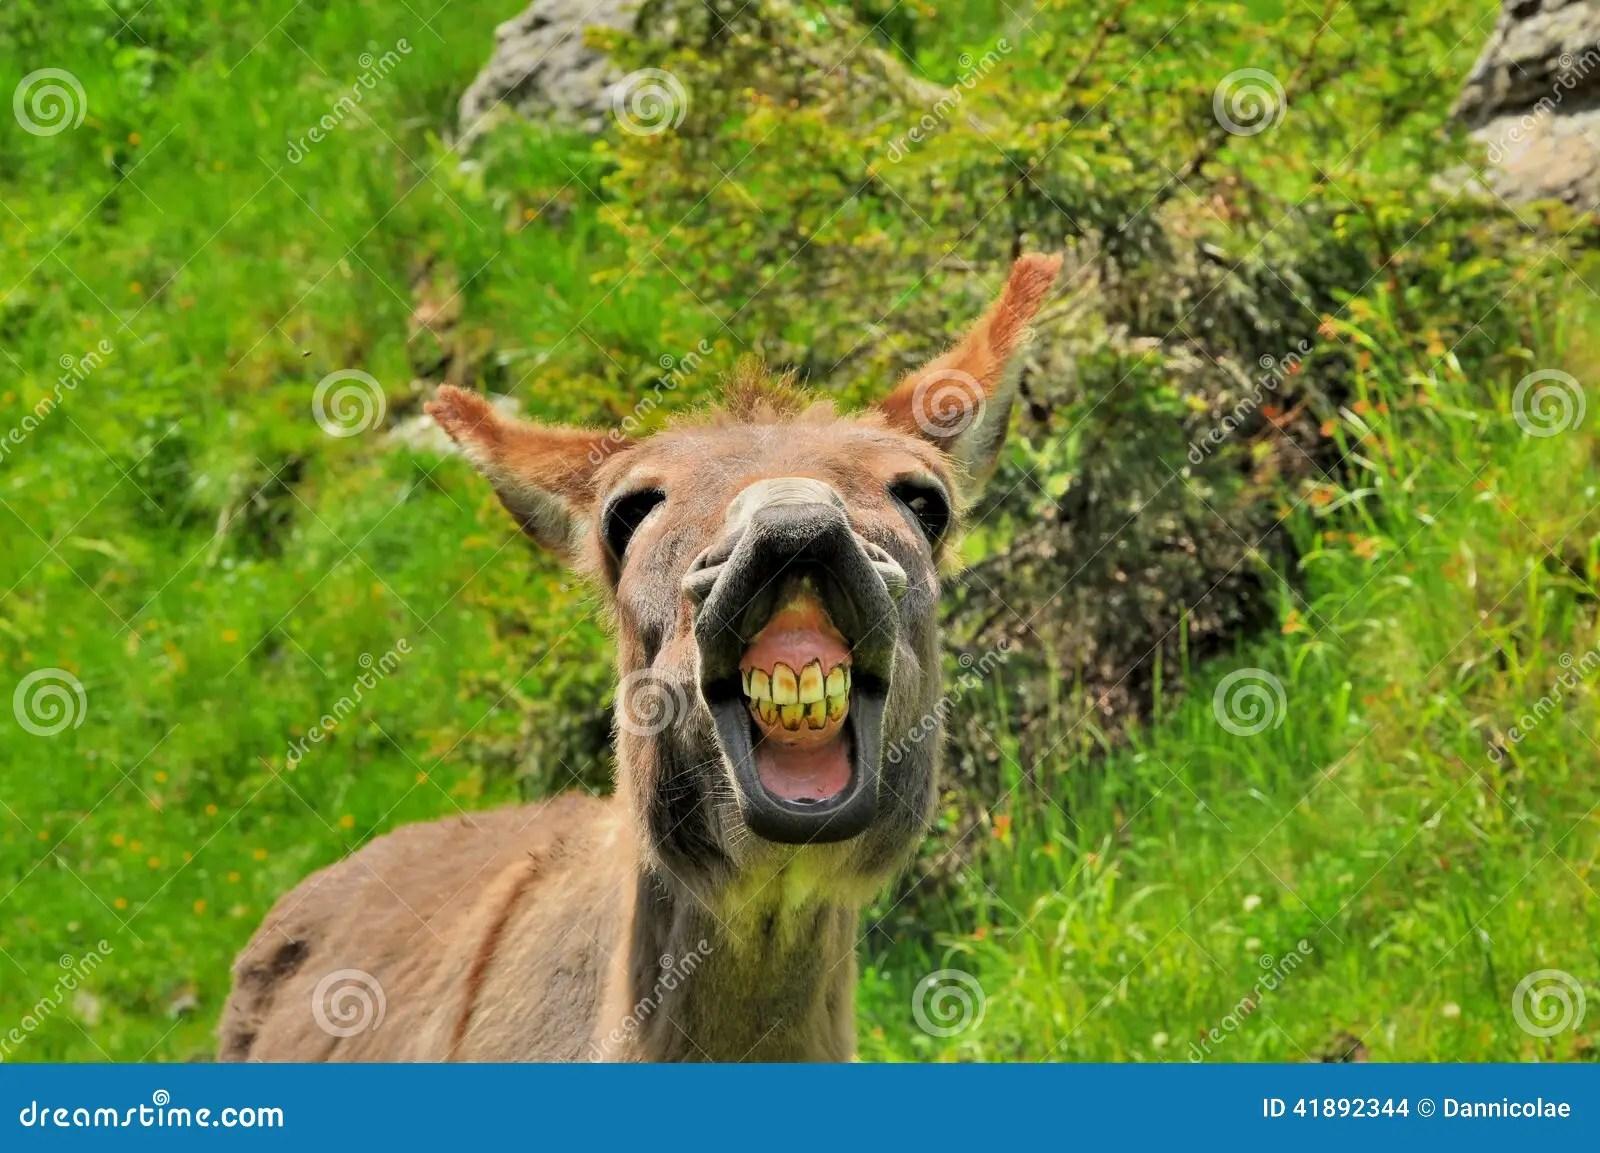 Cute Donkey Wallpaper Funny Donkey Stock Photo Image Of Donkey Grey Happy